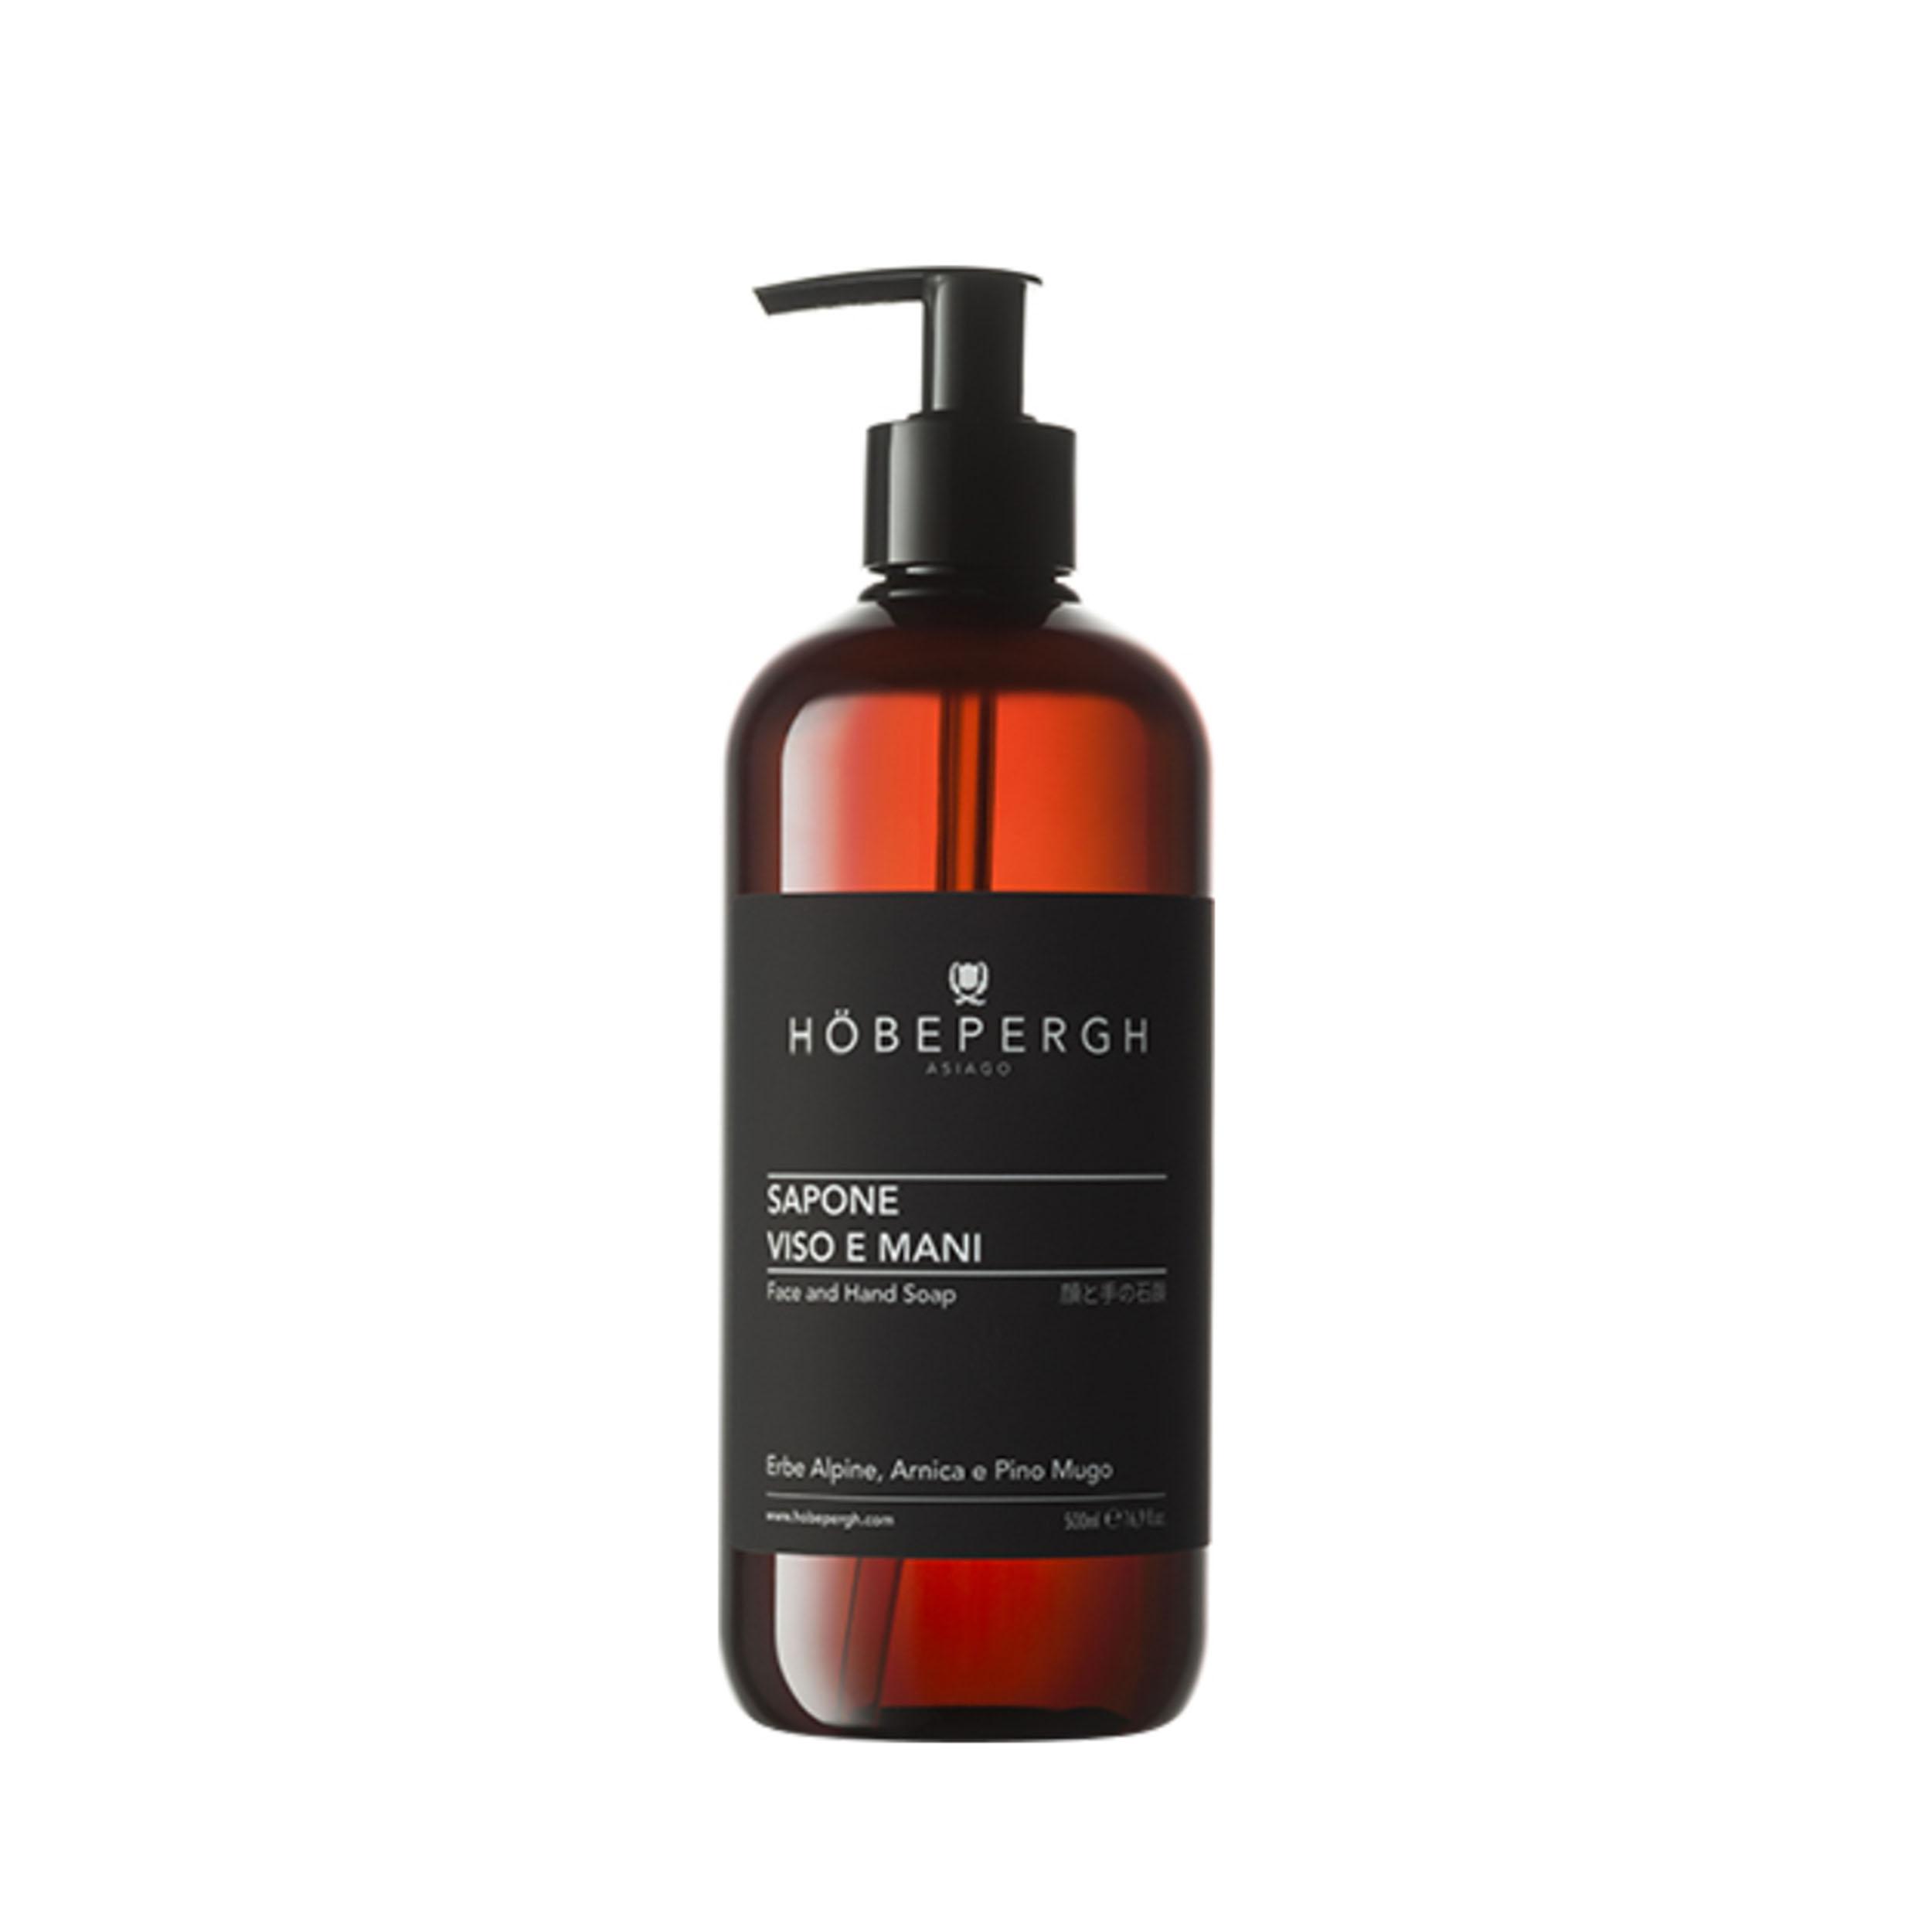 HOBEPERGH Жидкое мыло для лица и рук 500 мл фото